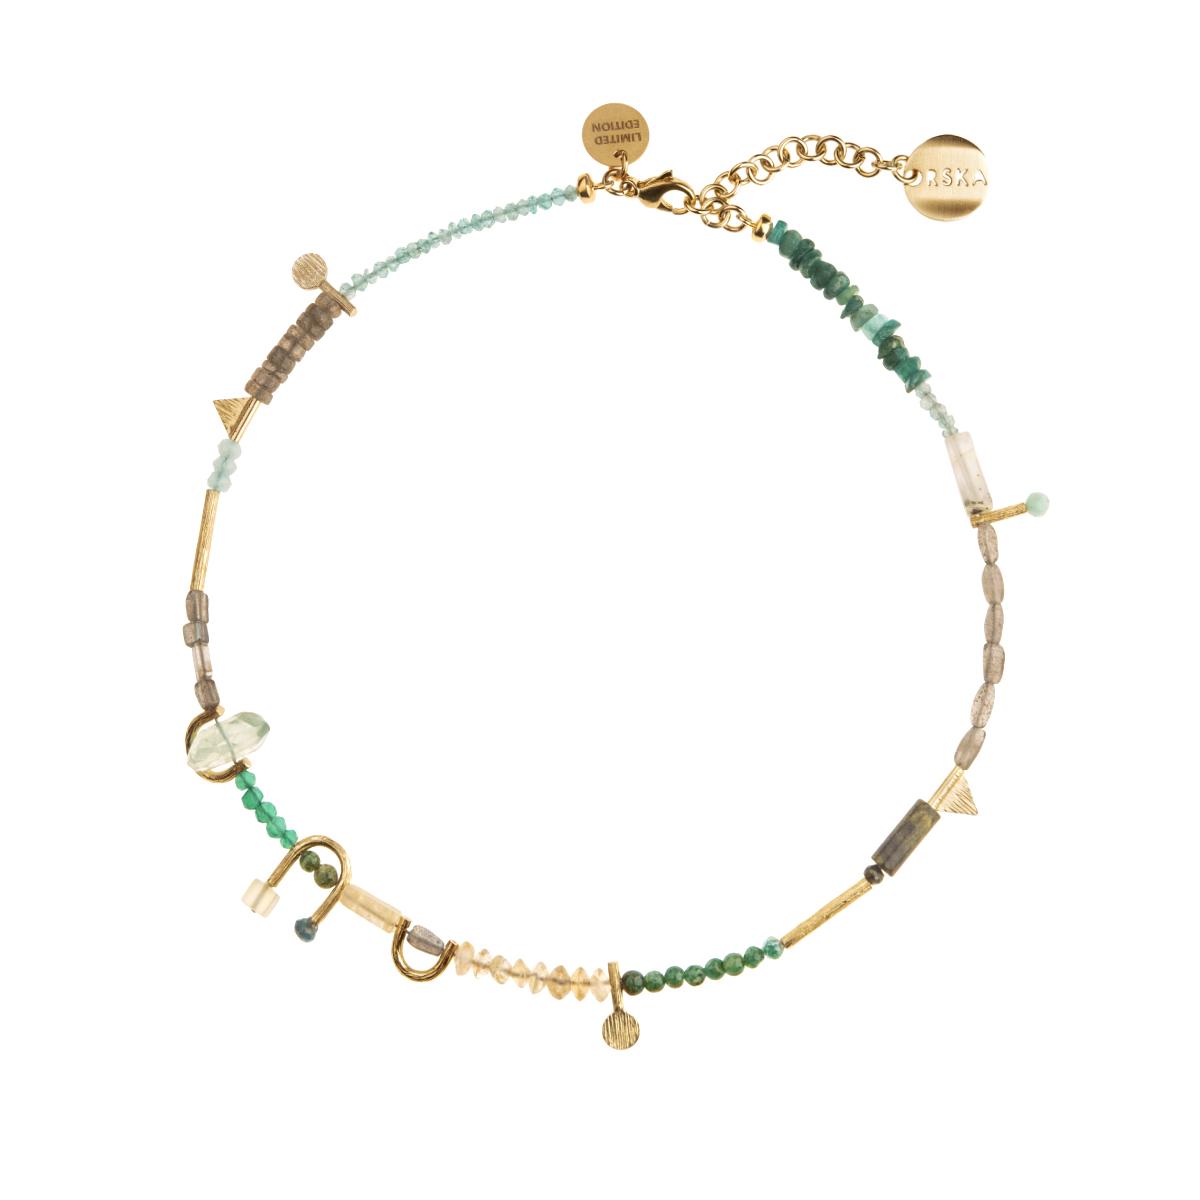 Gelato - soczysta kolekcja biżuterii Orska